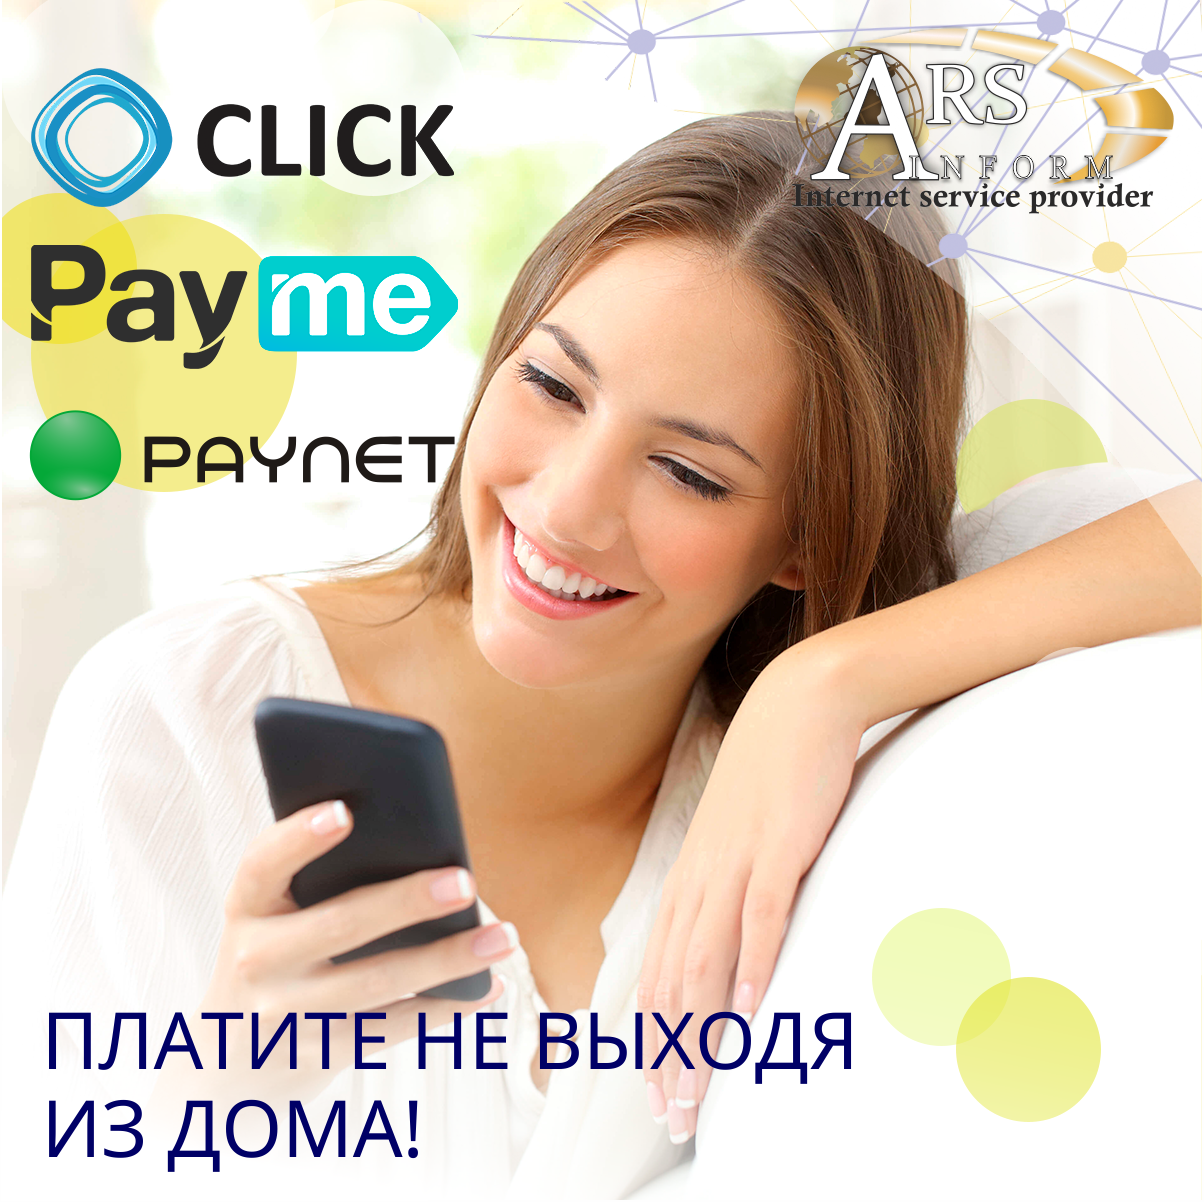 Прямая оплата онлайн!